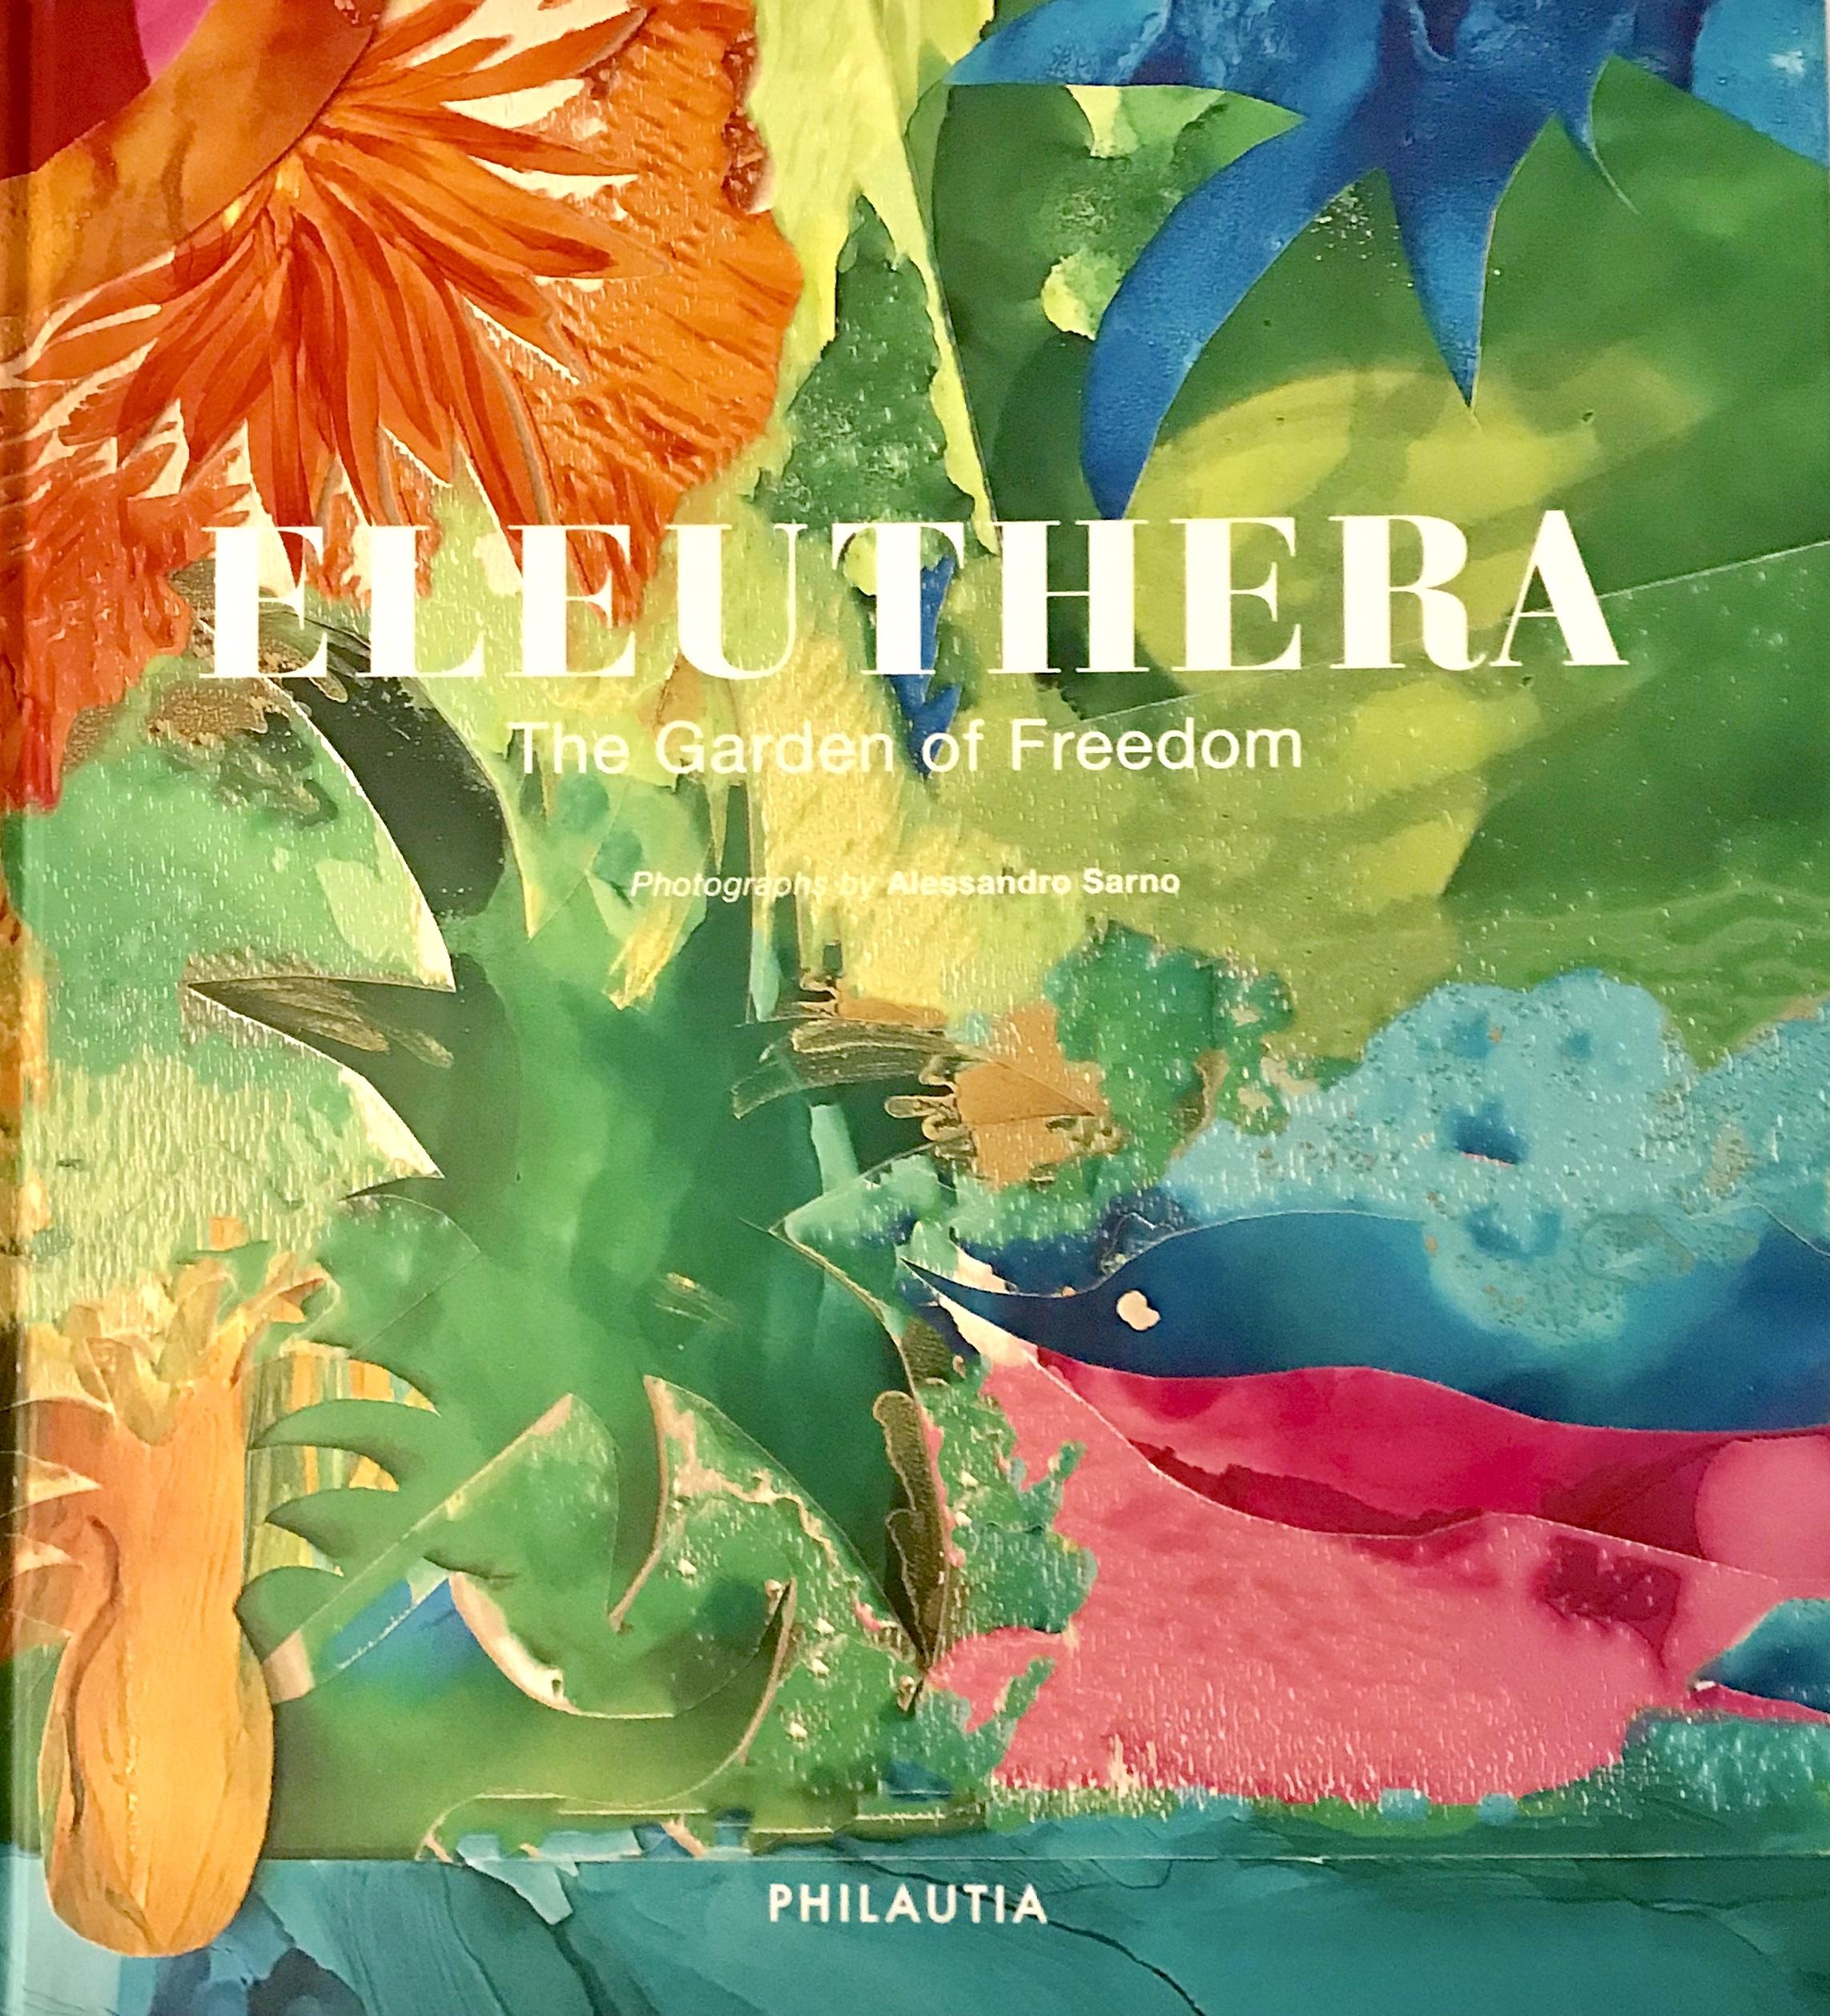 Eleuthera.Garden.of.Freedom.Cover.jpg